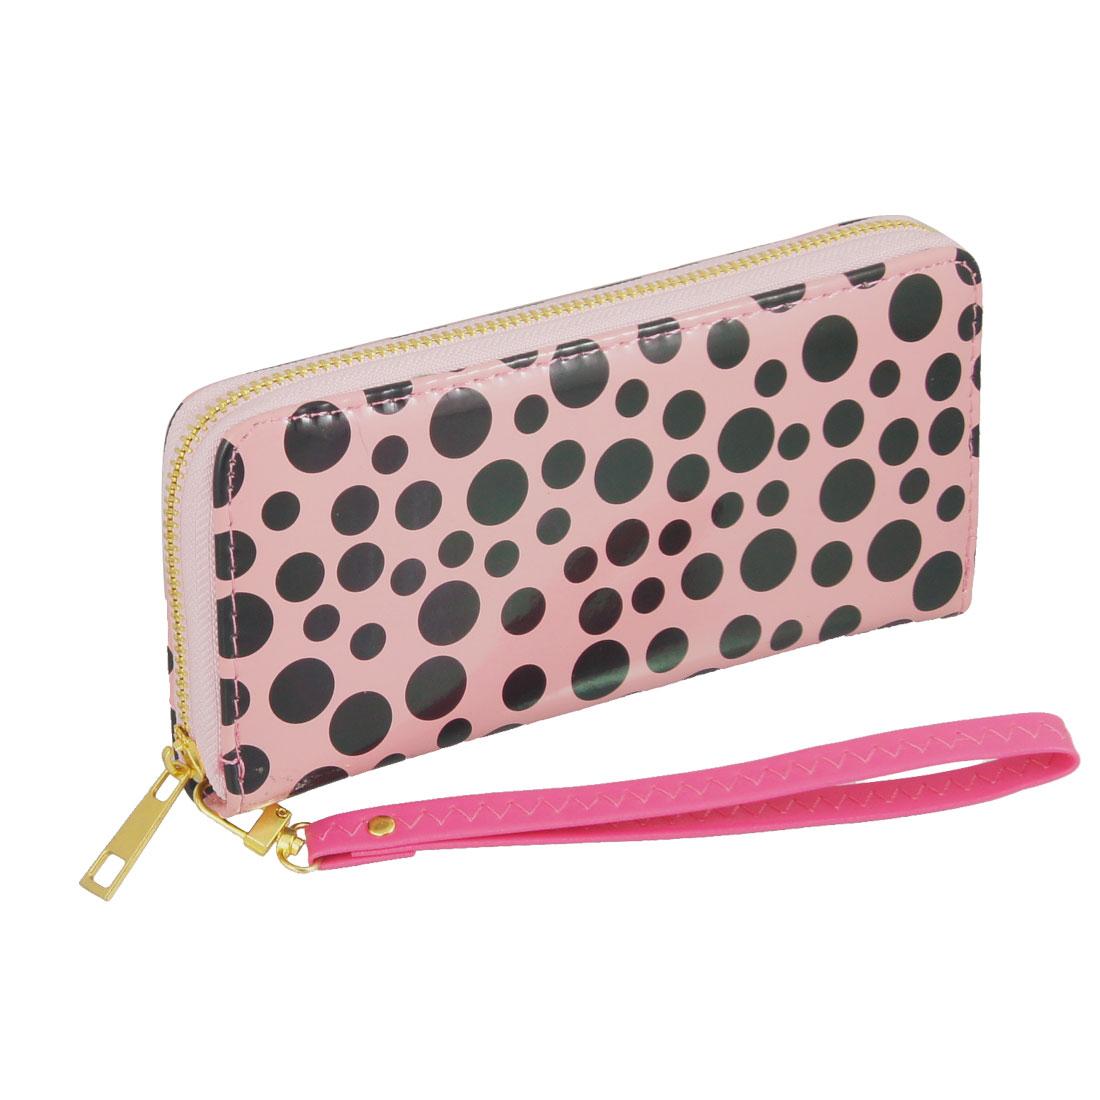 Lady Black Dots Prints Light Pink Faux Leather Hand Strap Wallet